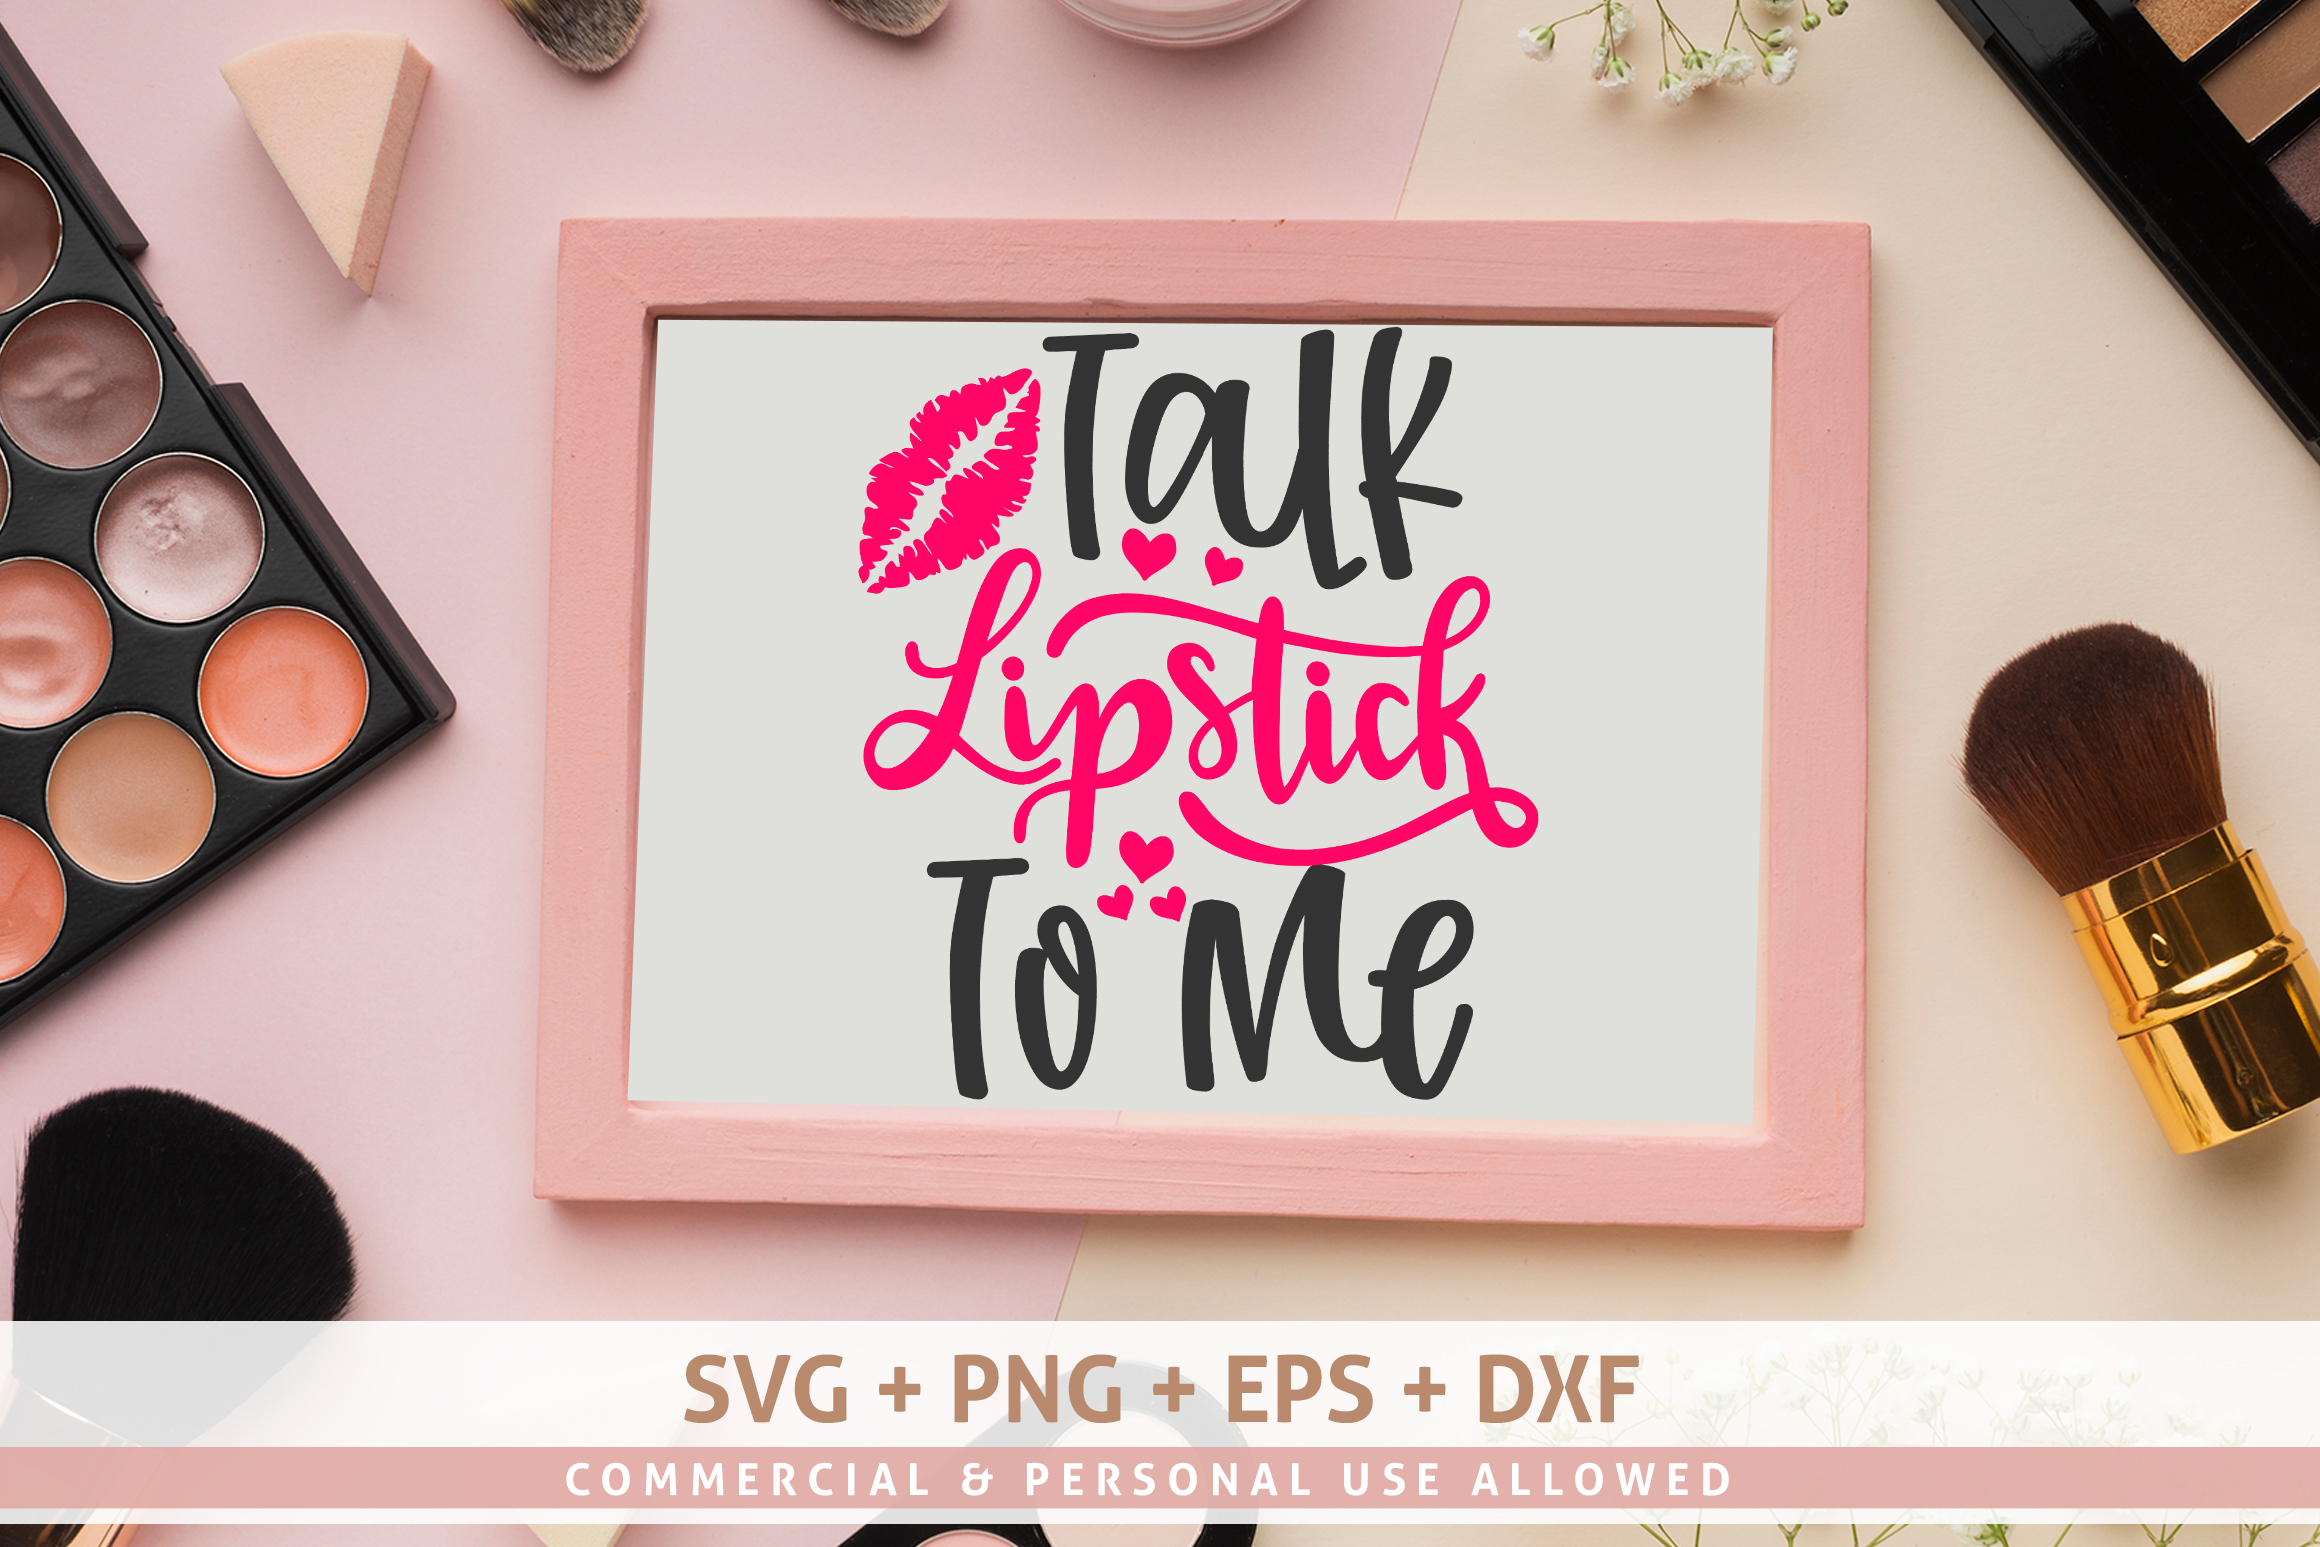 Talk Lipstick To Me SVG example image 1